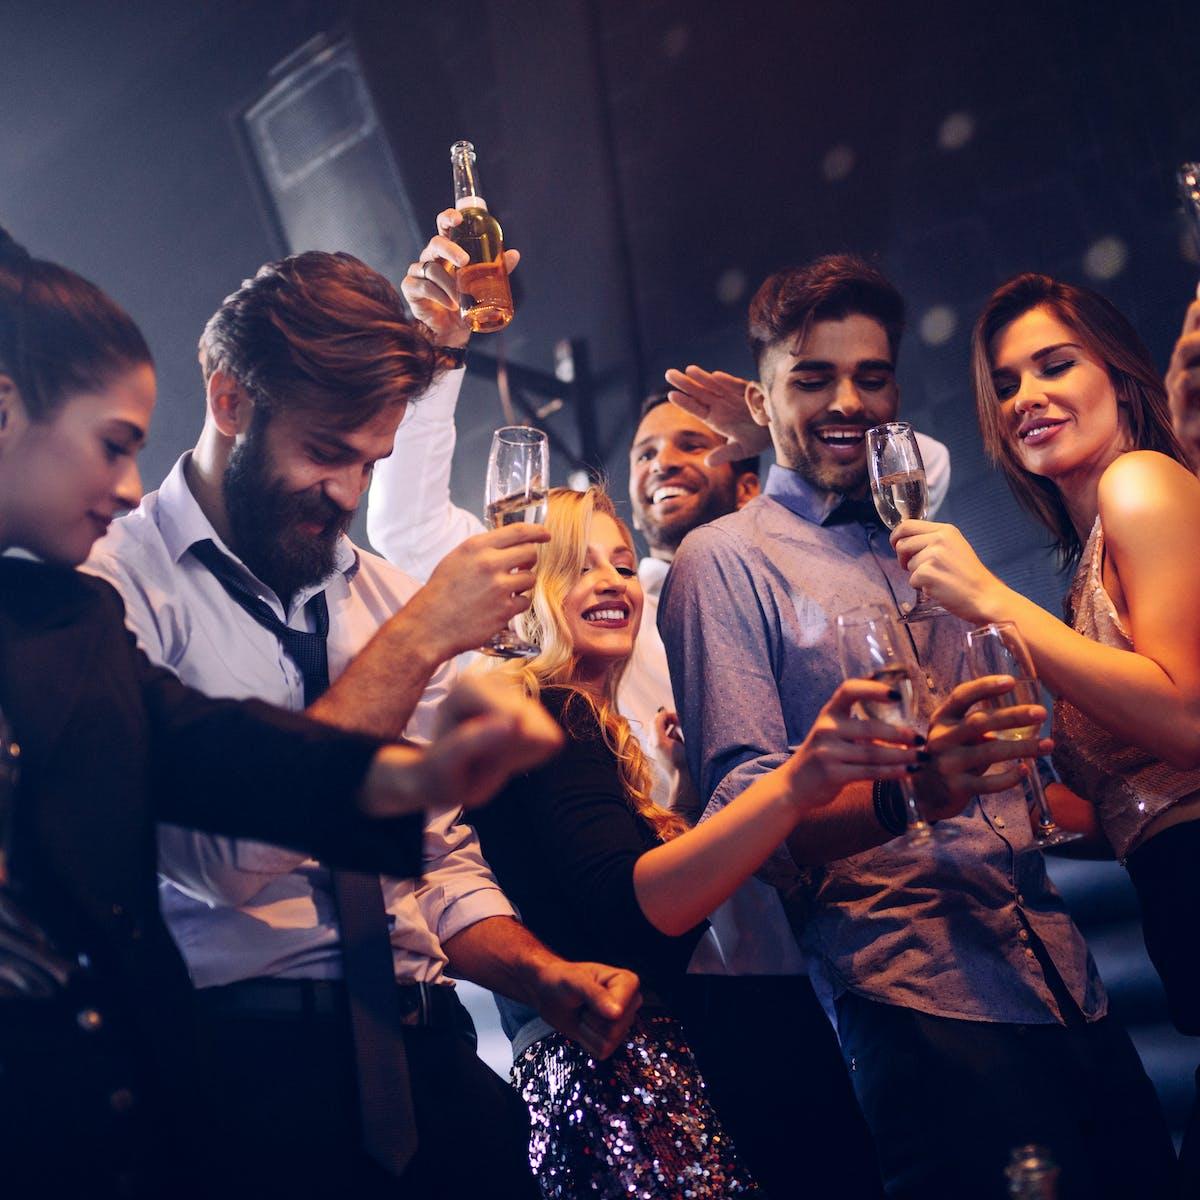 Groping : Groping And Grabbing Is Not Acceptable Nightclub